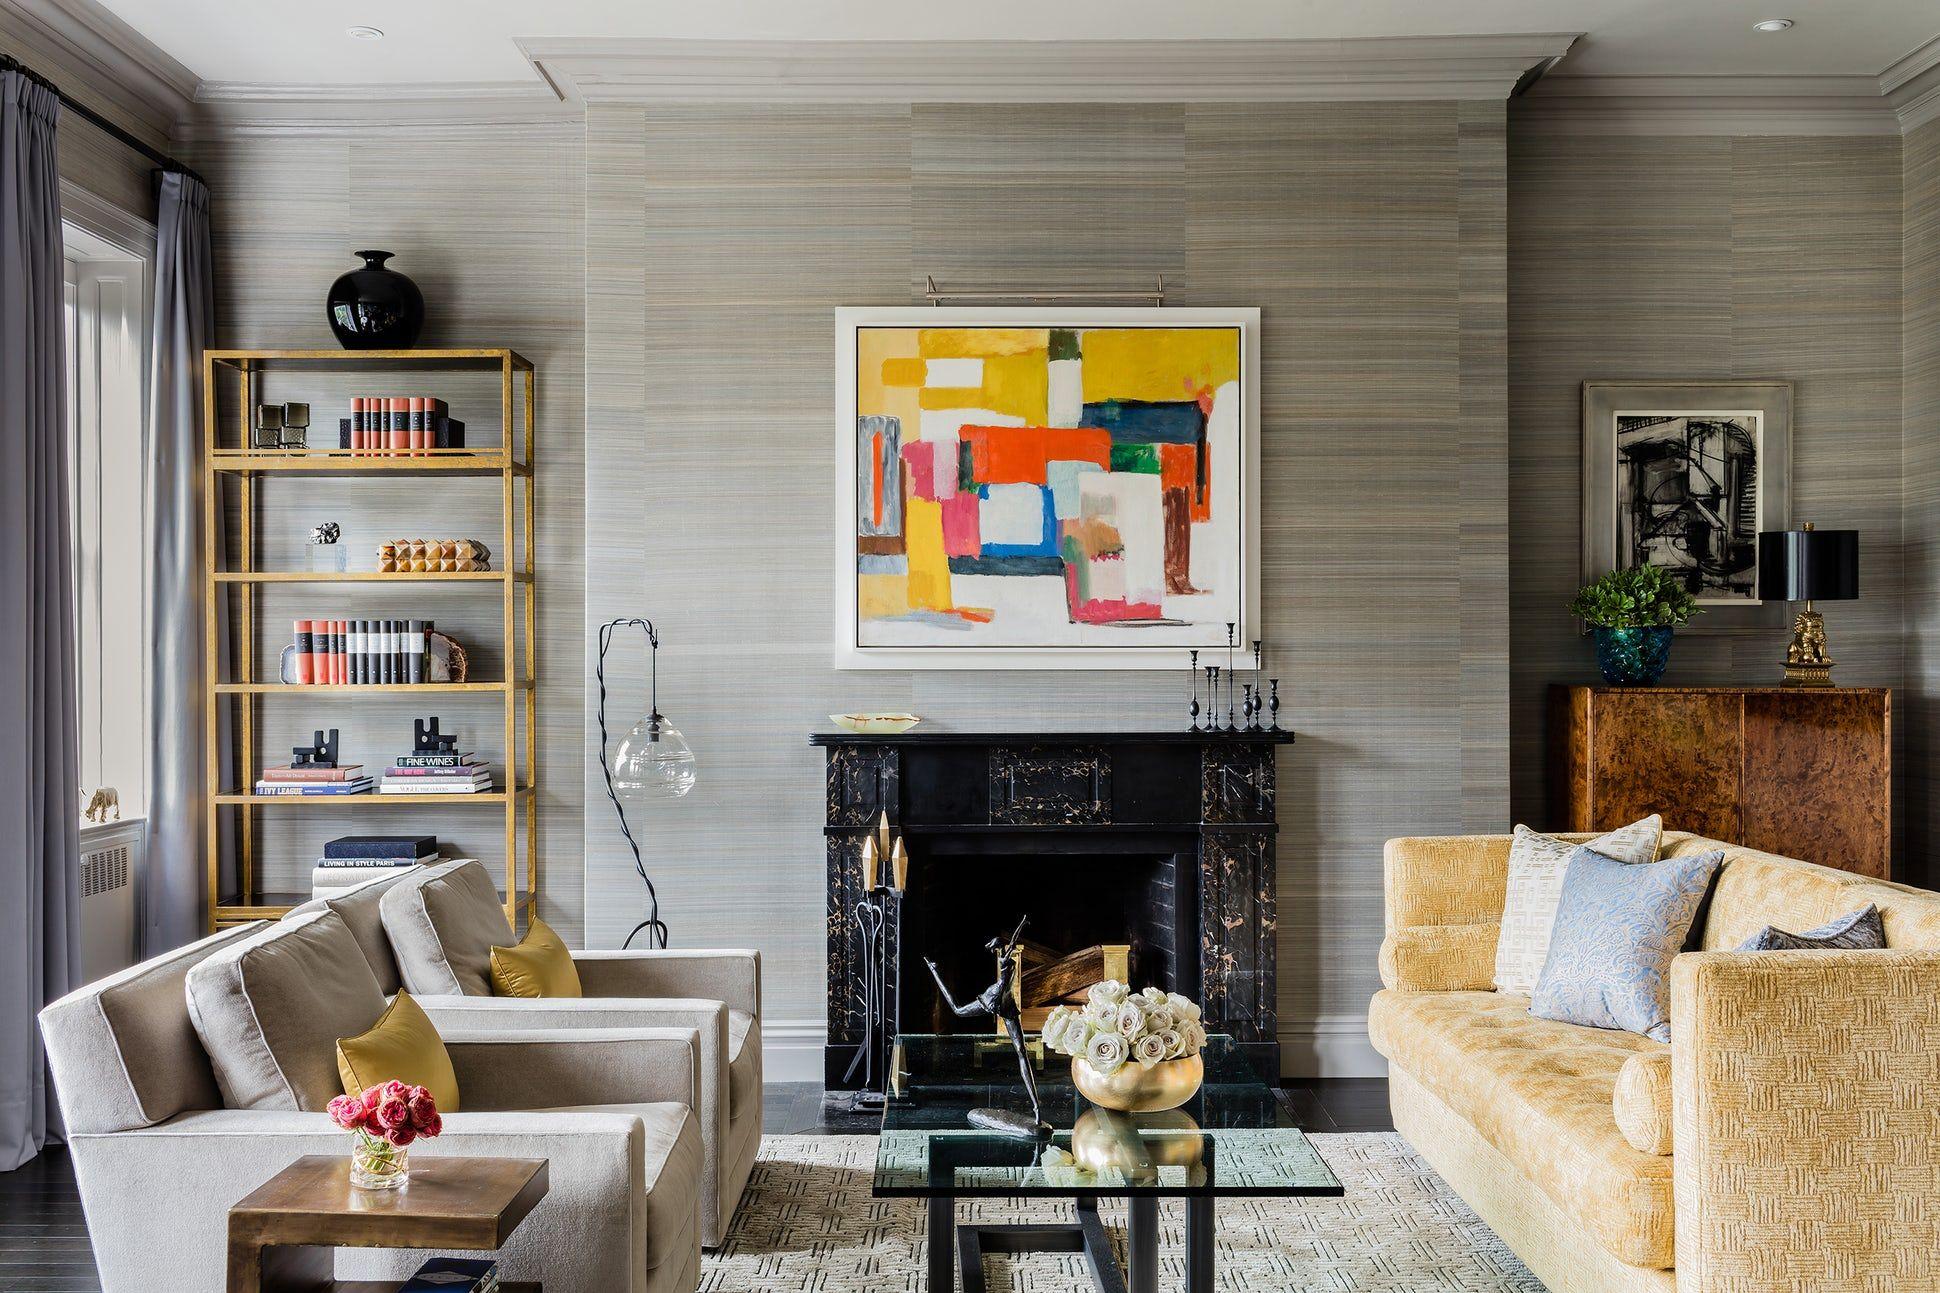 65 best fireplace ideas beautiful fireplace designs decor rh elledecor com Ideas with Television above Fireplace Fireplace Surround Ideas